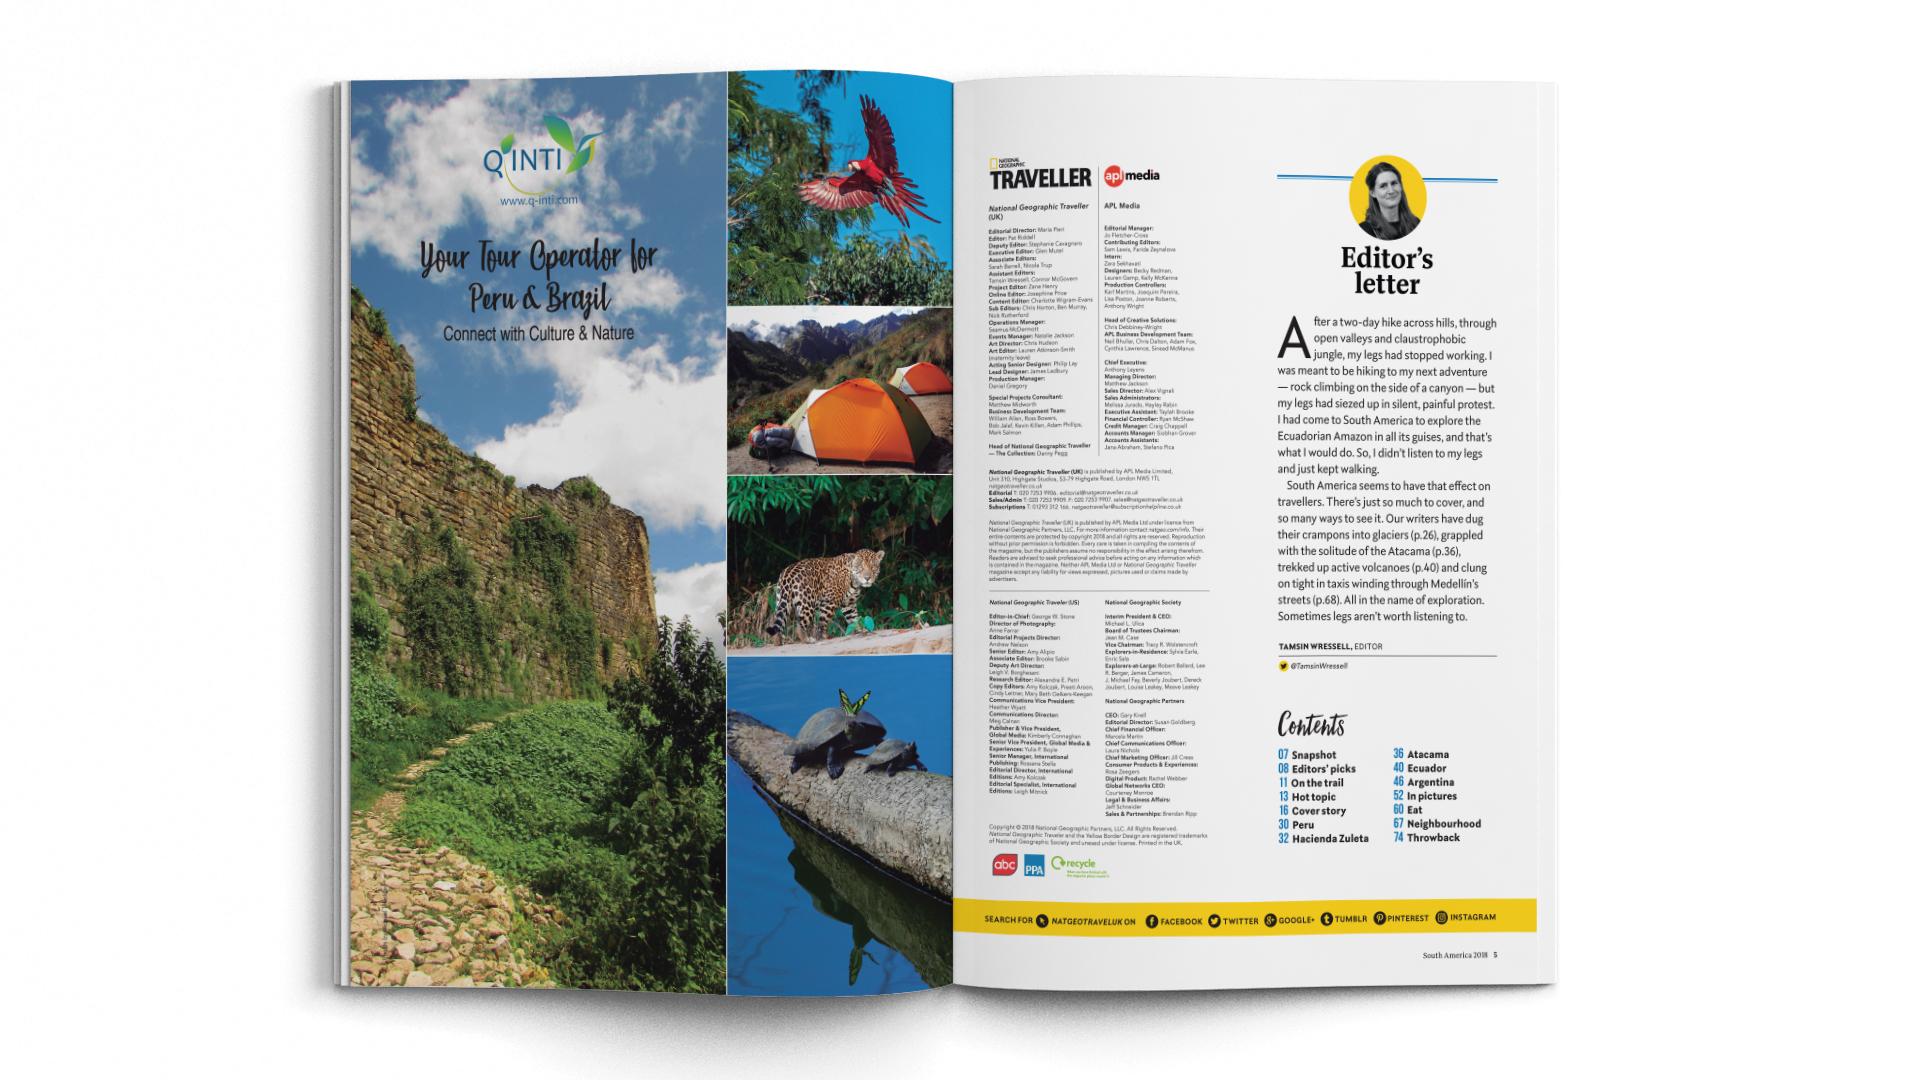 A4-Magazine-DPS-NGT-SA-Ed-letter